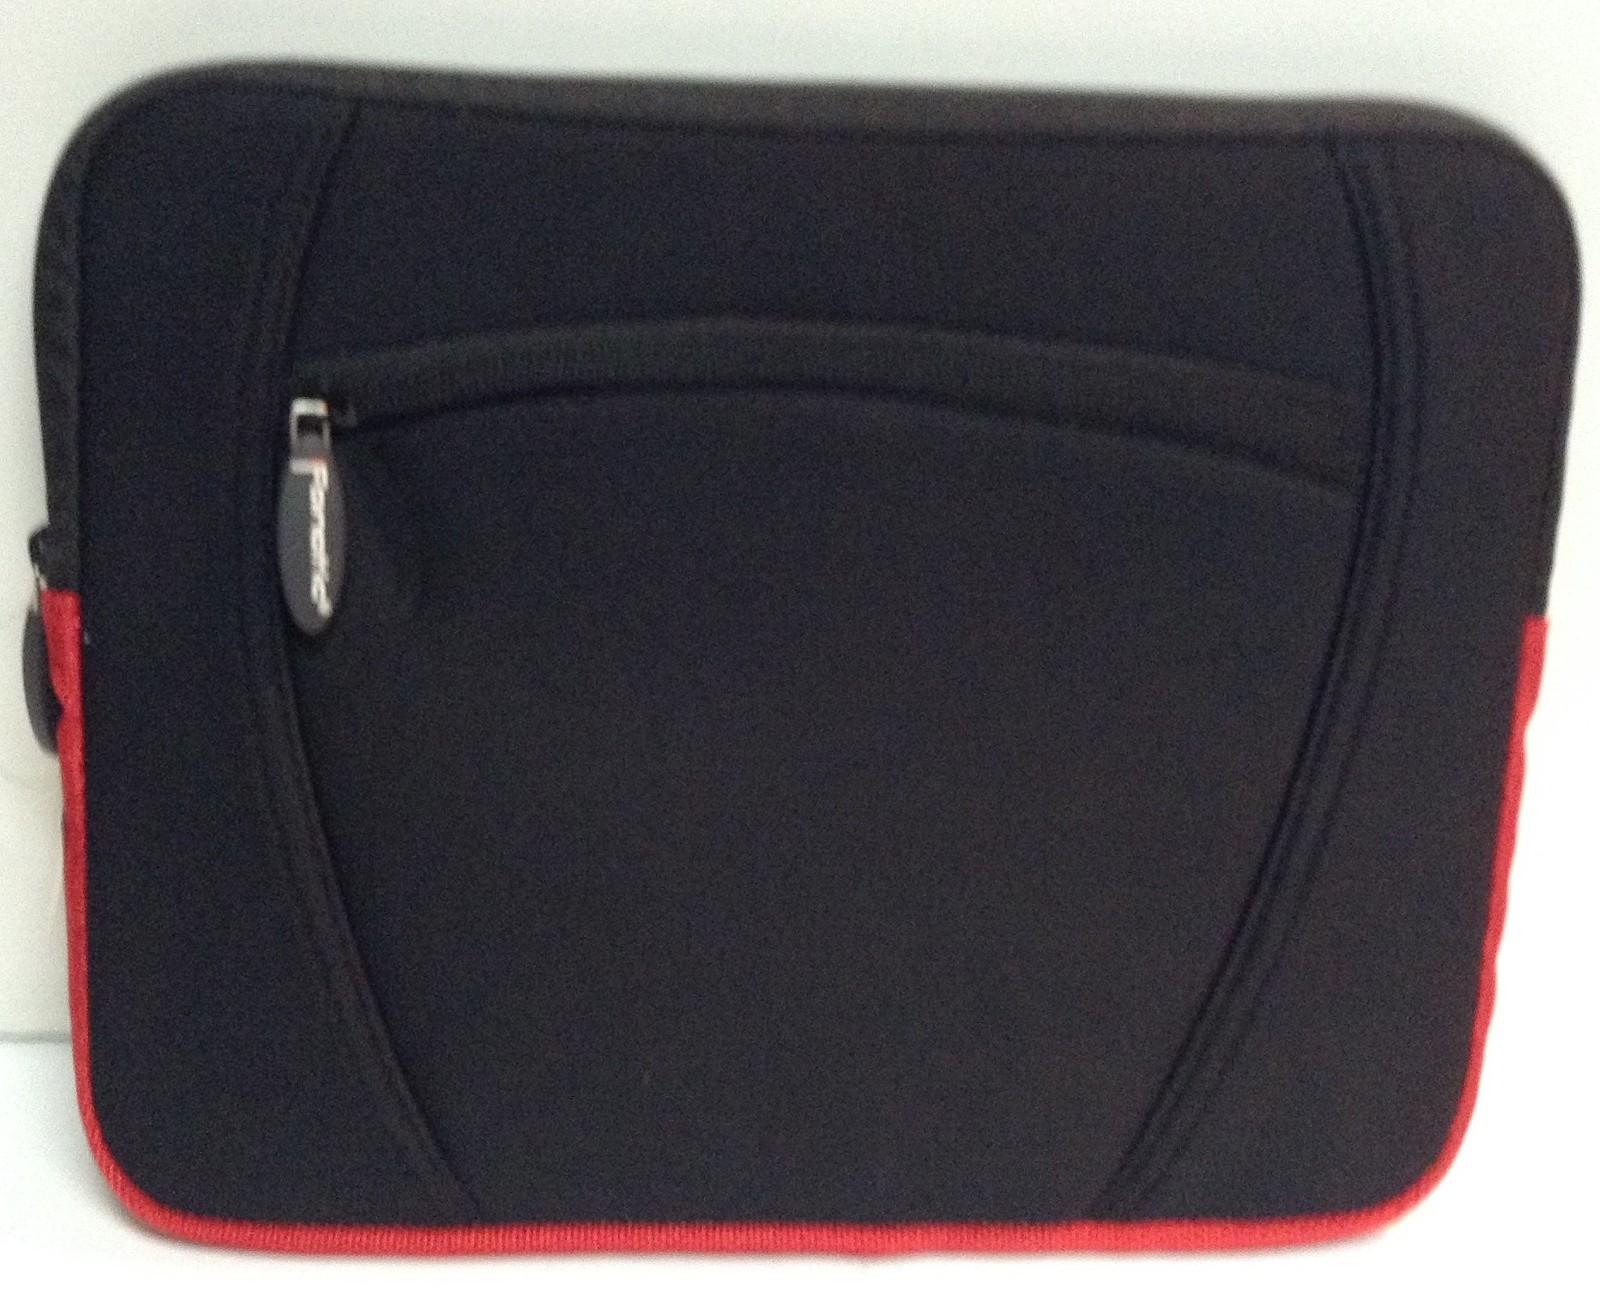 North Carolina State Tablet Ipad Laptop Protection Case